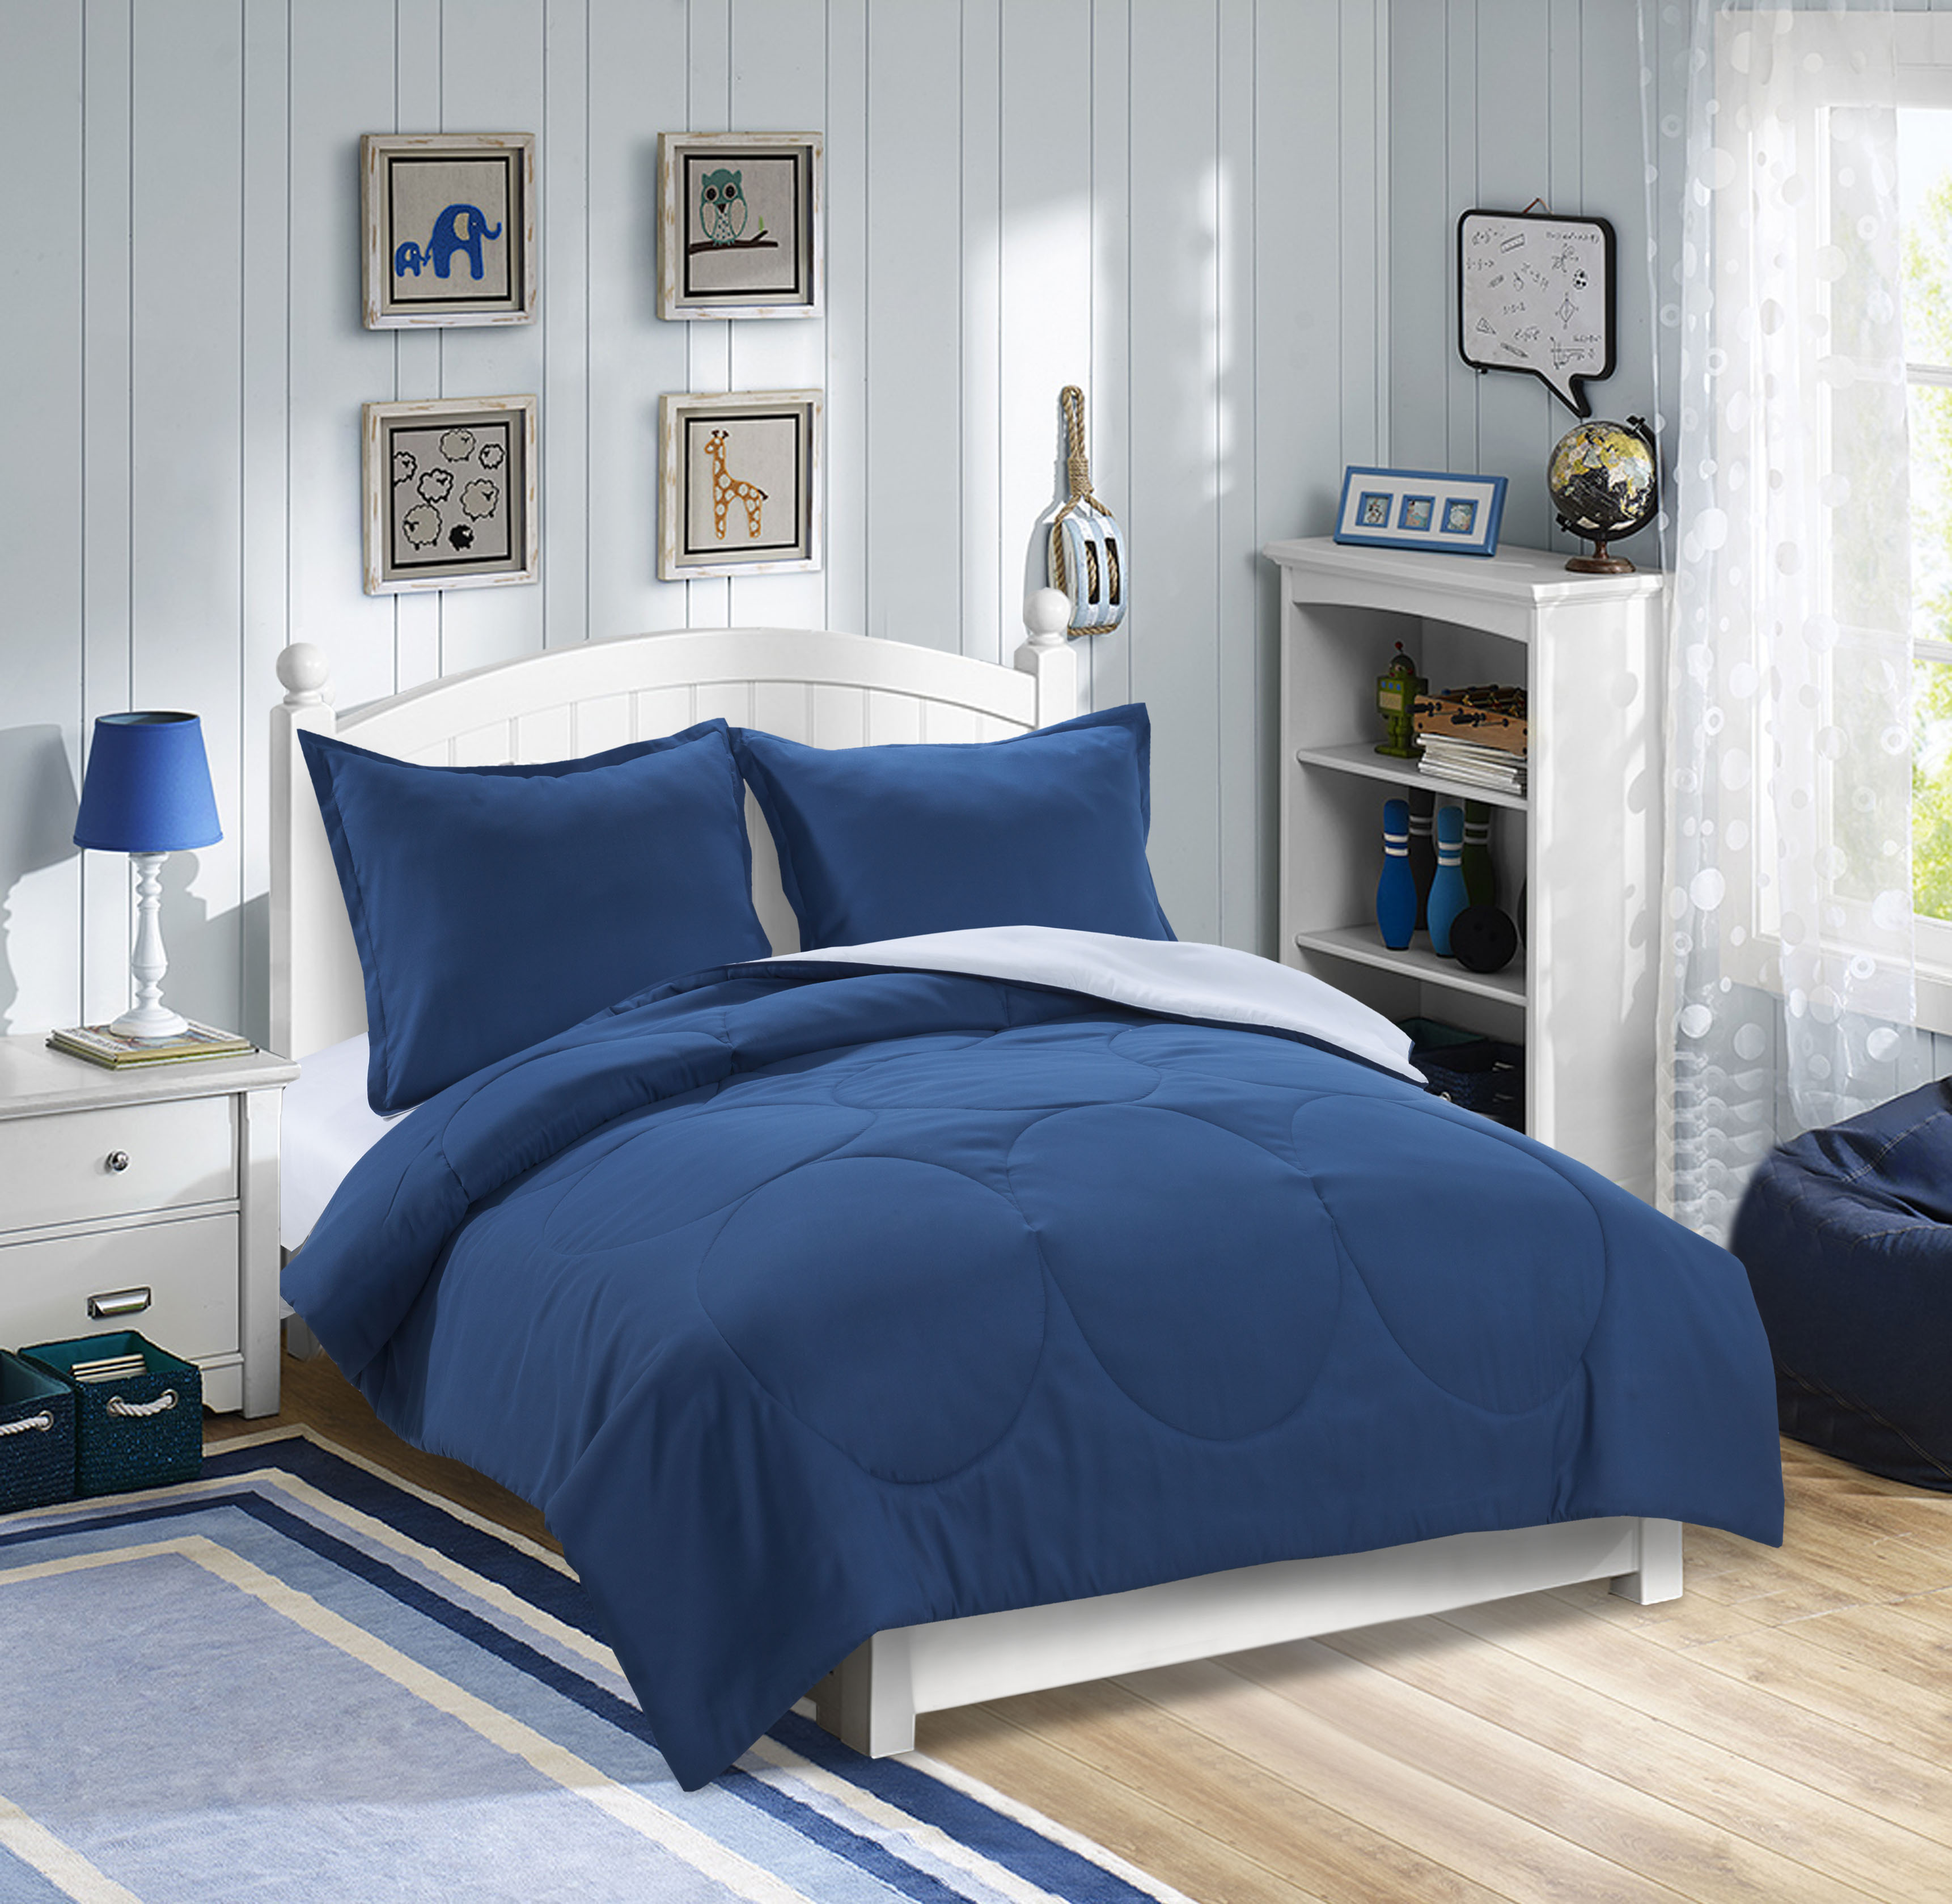 Mainstays Kids Solid Reversible Bedding Set